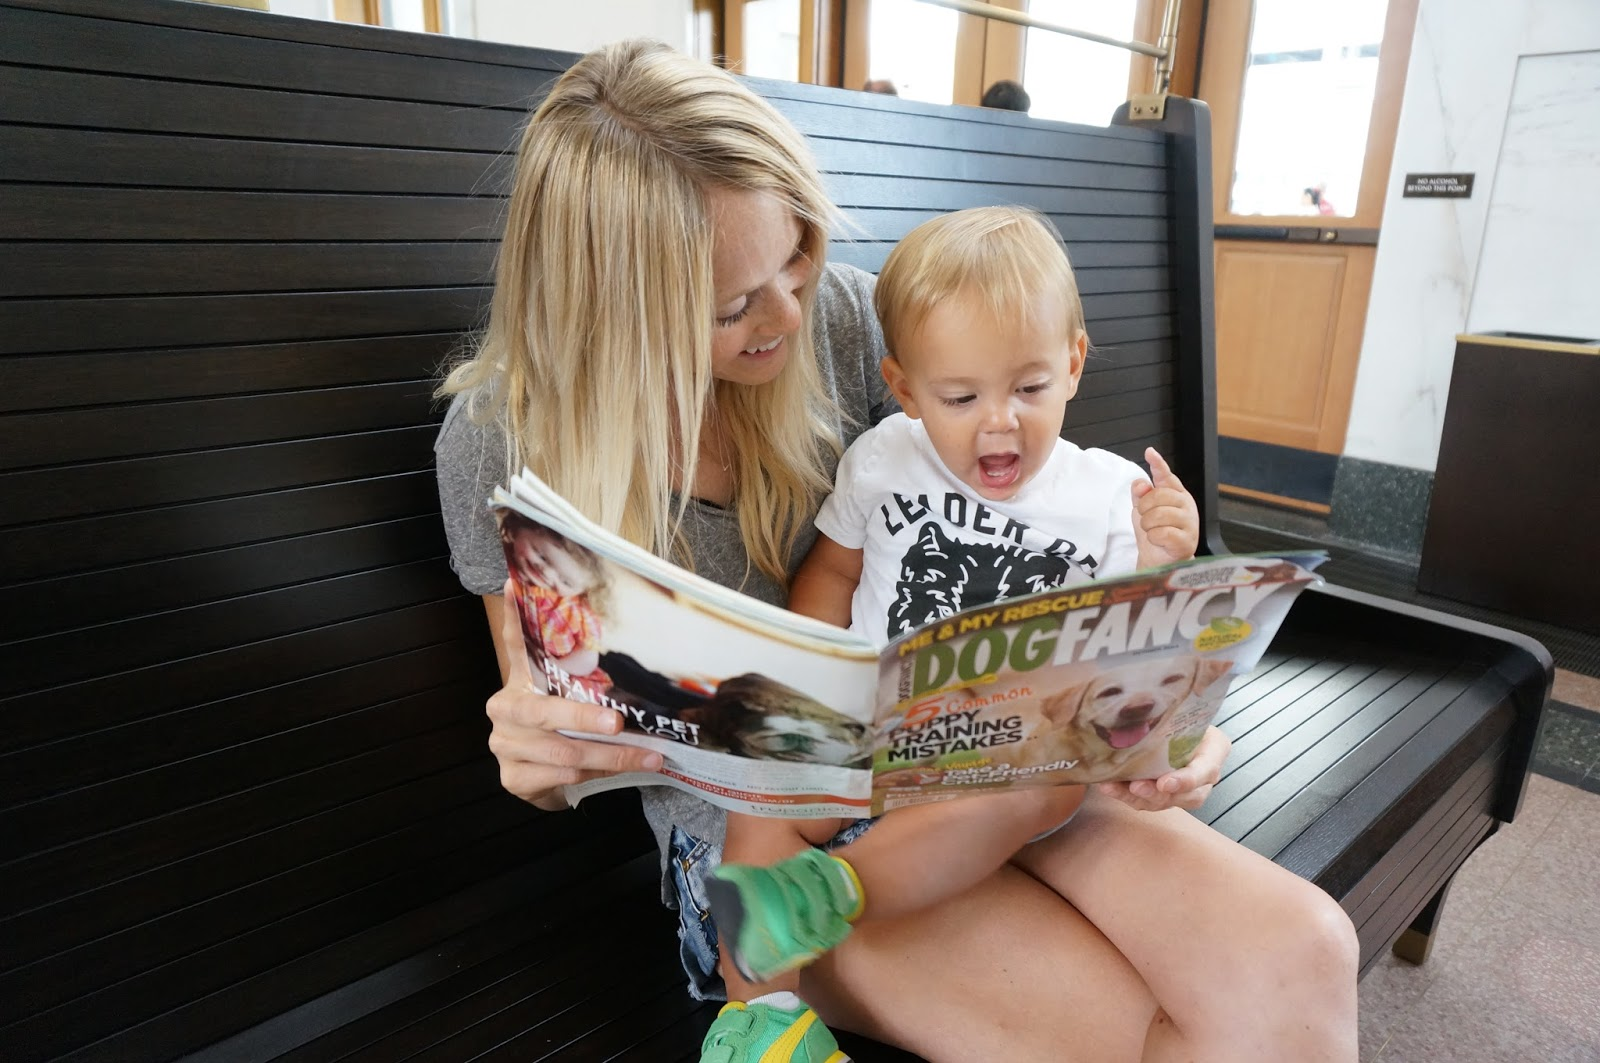 reading a magazine at Union Station